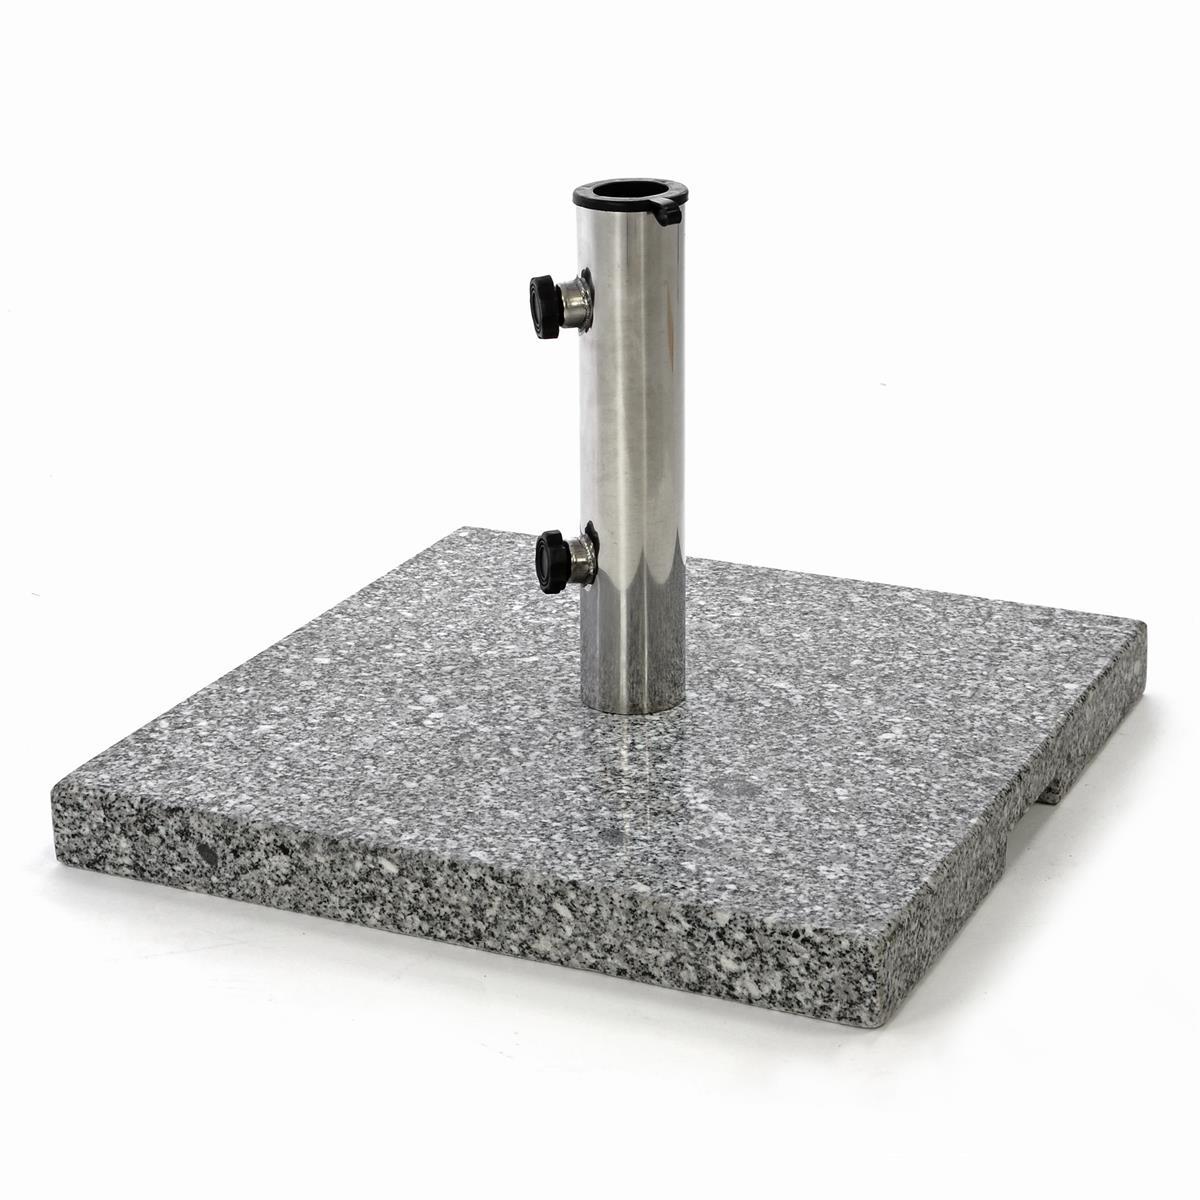 Sonnenschirmständer 26 kg Granit grau eckig 45x45 cm Edelstahlhülse Standfüße